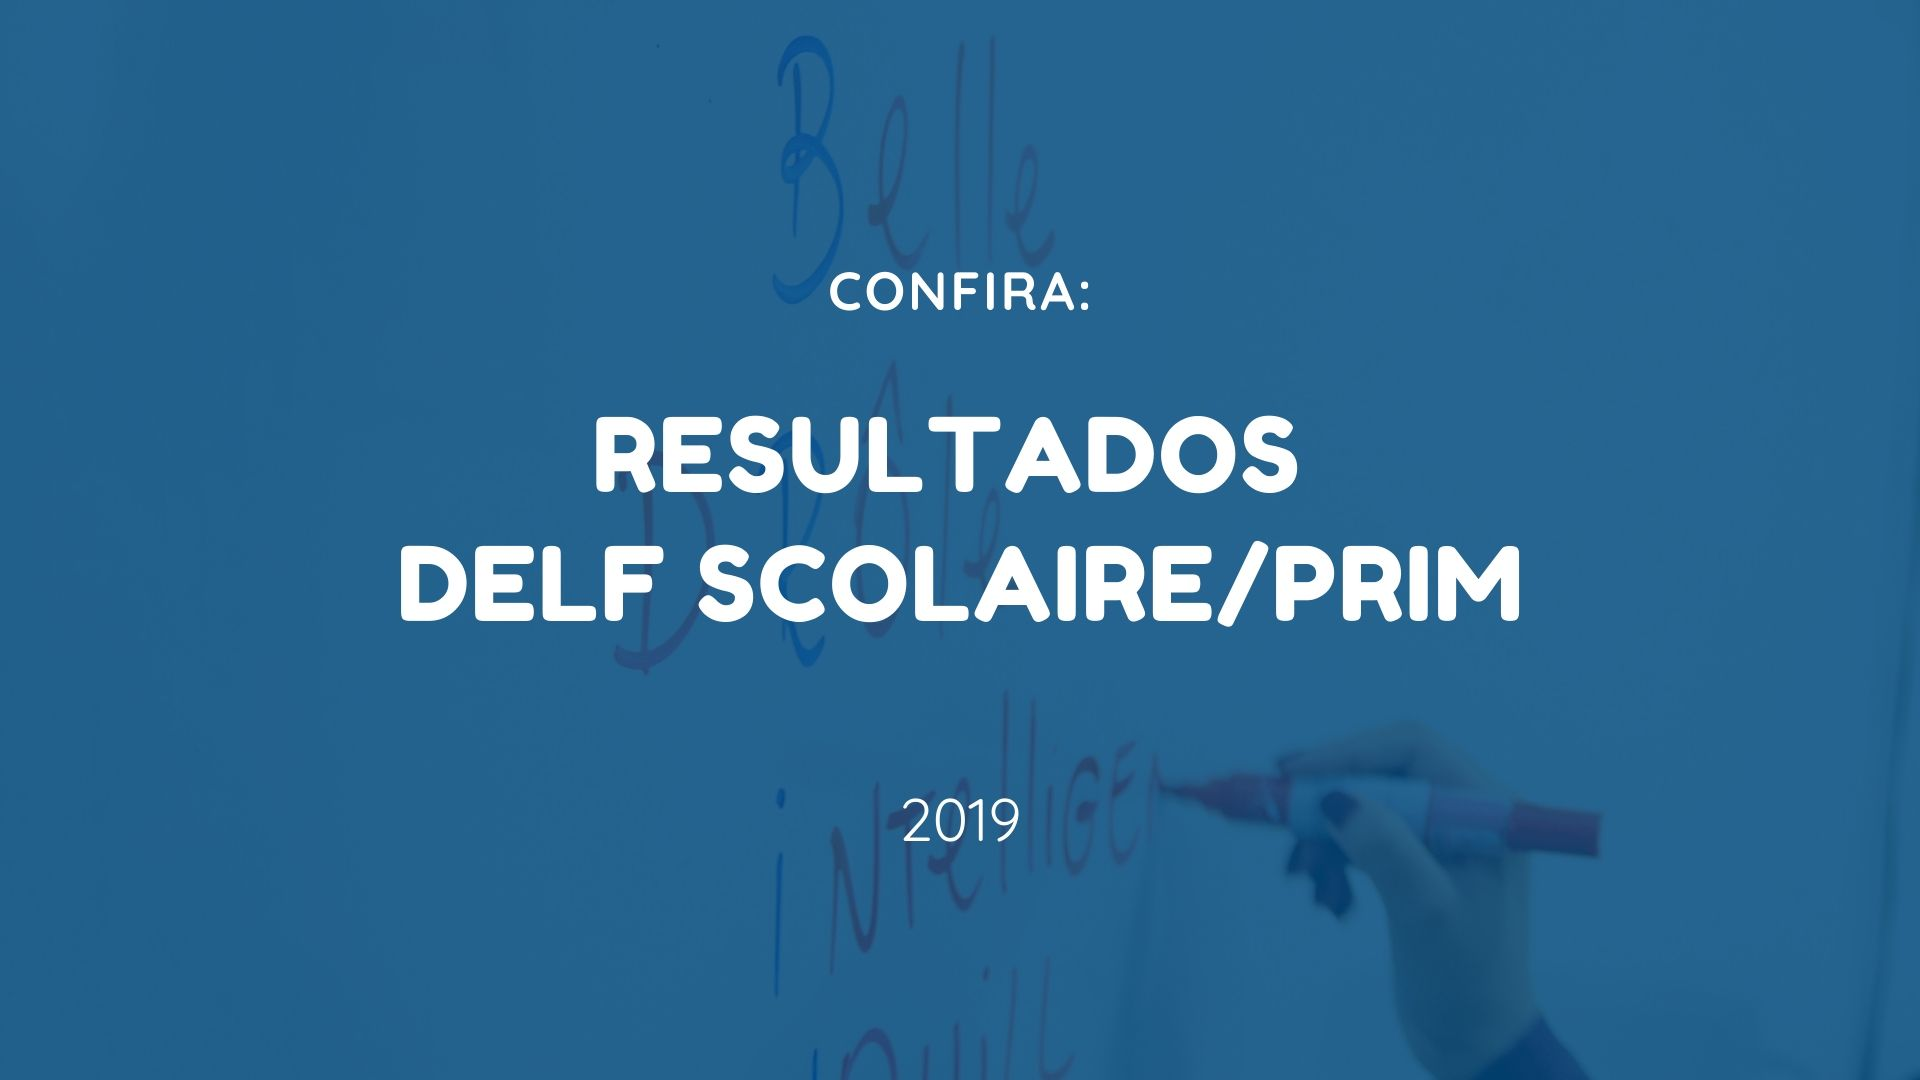 Resultados DELF SCOLAIRE/PRIM 2019